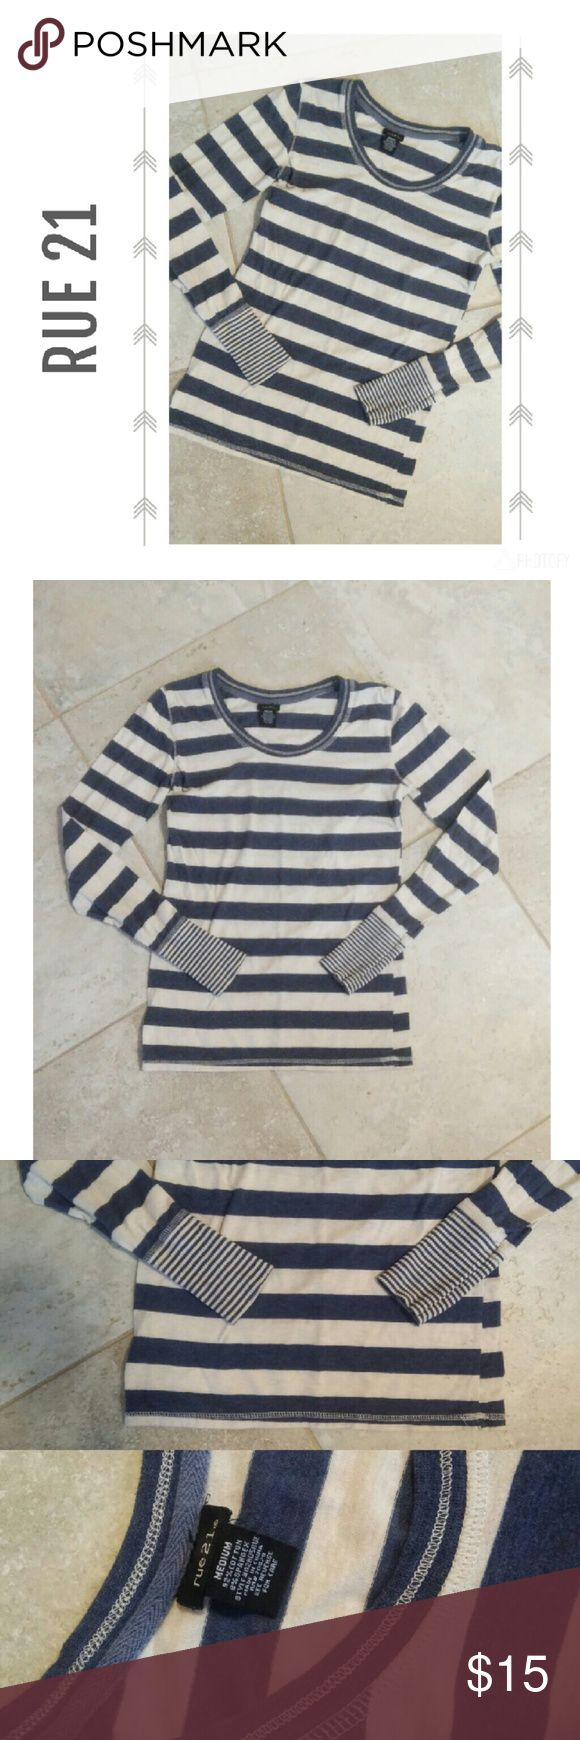 {Rue 21} blue & cream stripe long sleeve shirt Rue 21 Blue & cream Stripe Long sleeve shirt Size medium  Great condition! Rue 21 Tops Tees - Long Sleeve